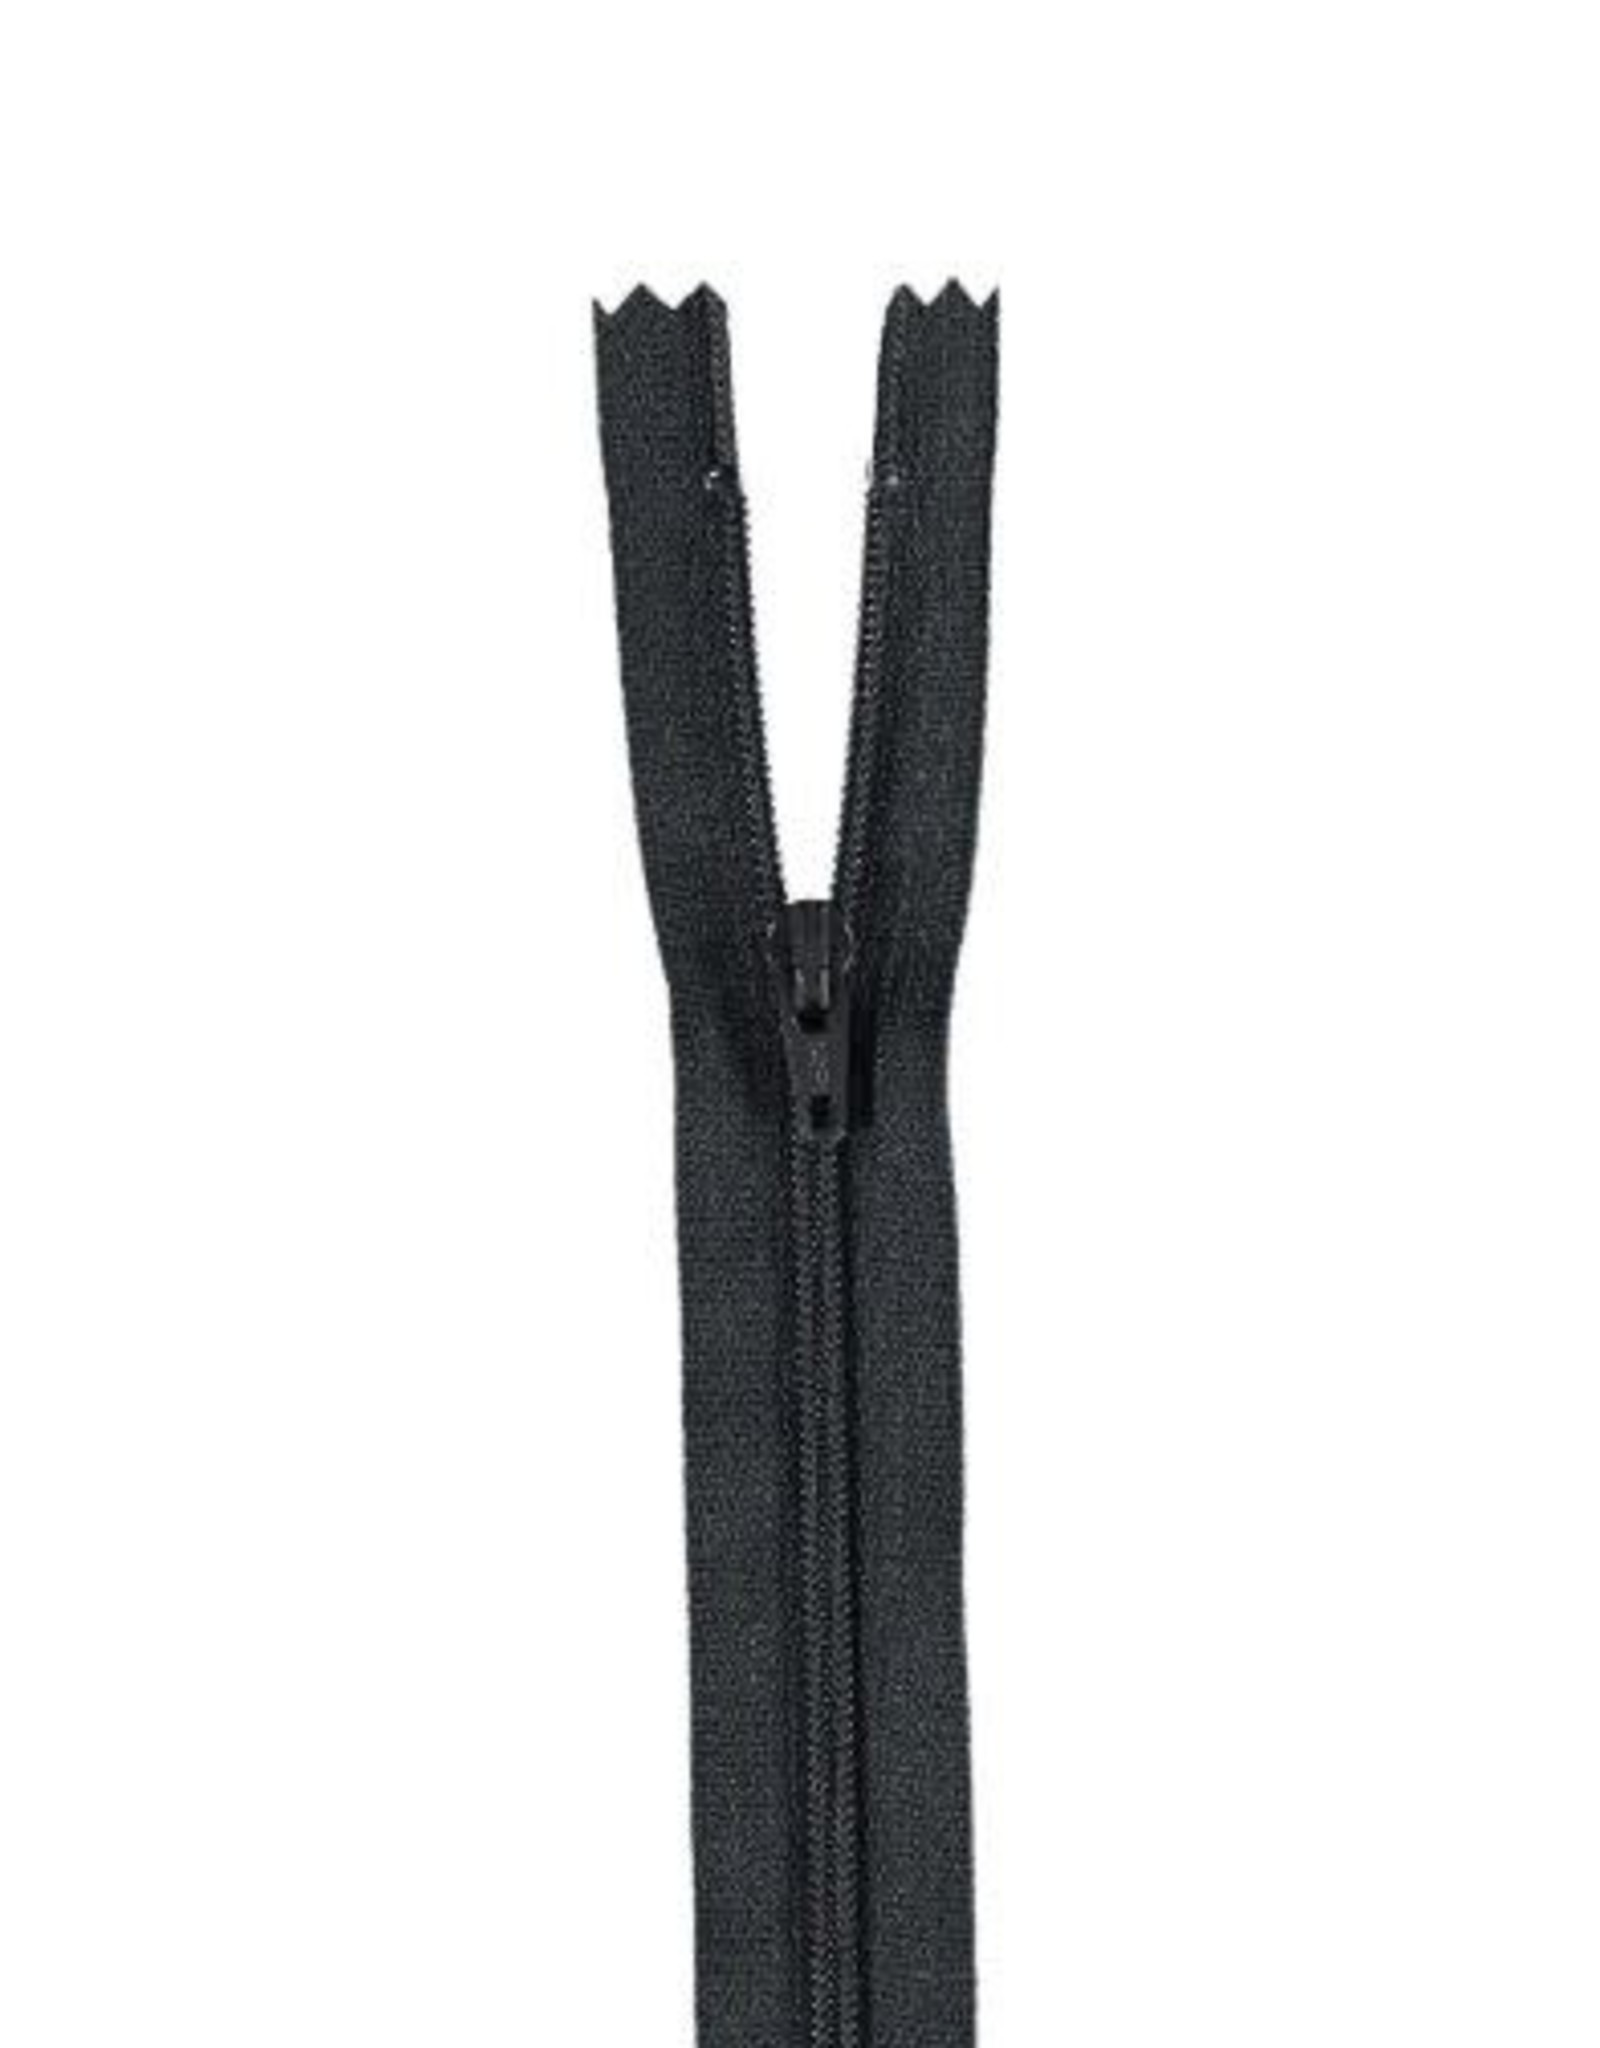 YKK Spiraalrits niet-DB 3mm antraciet 156-25cm